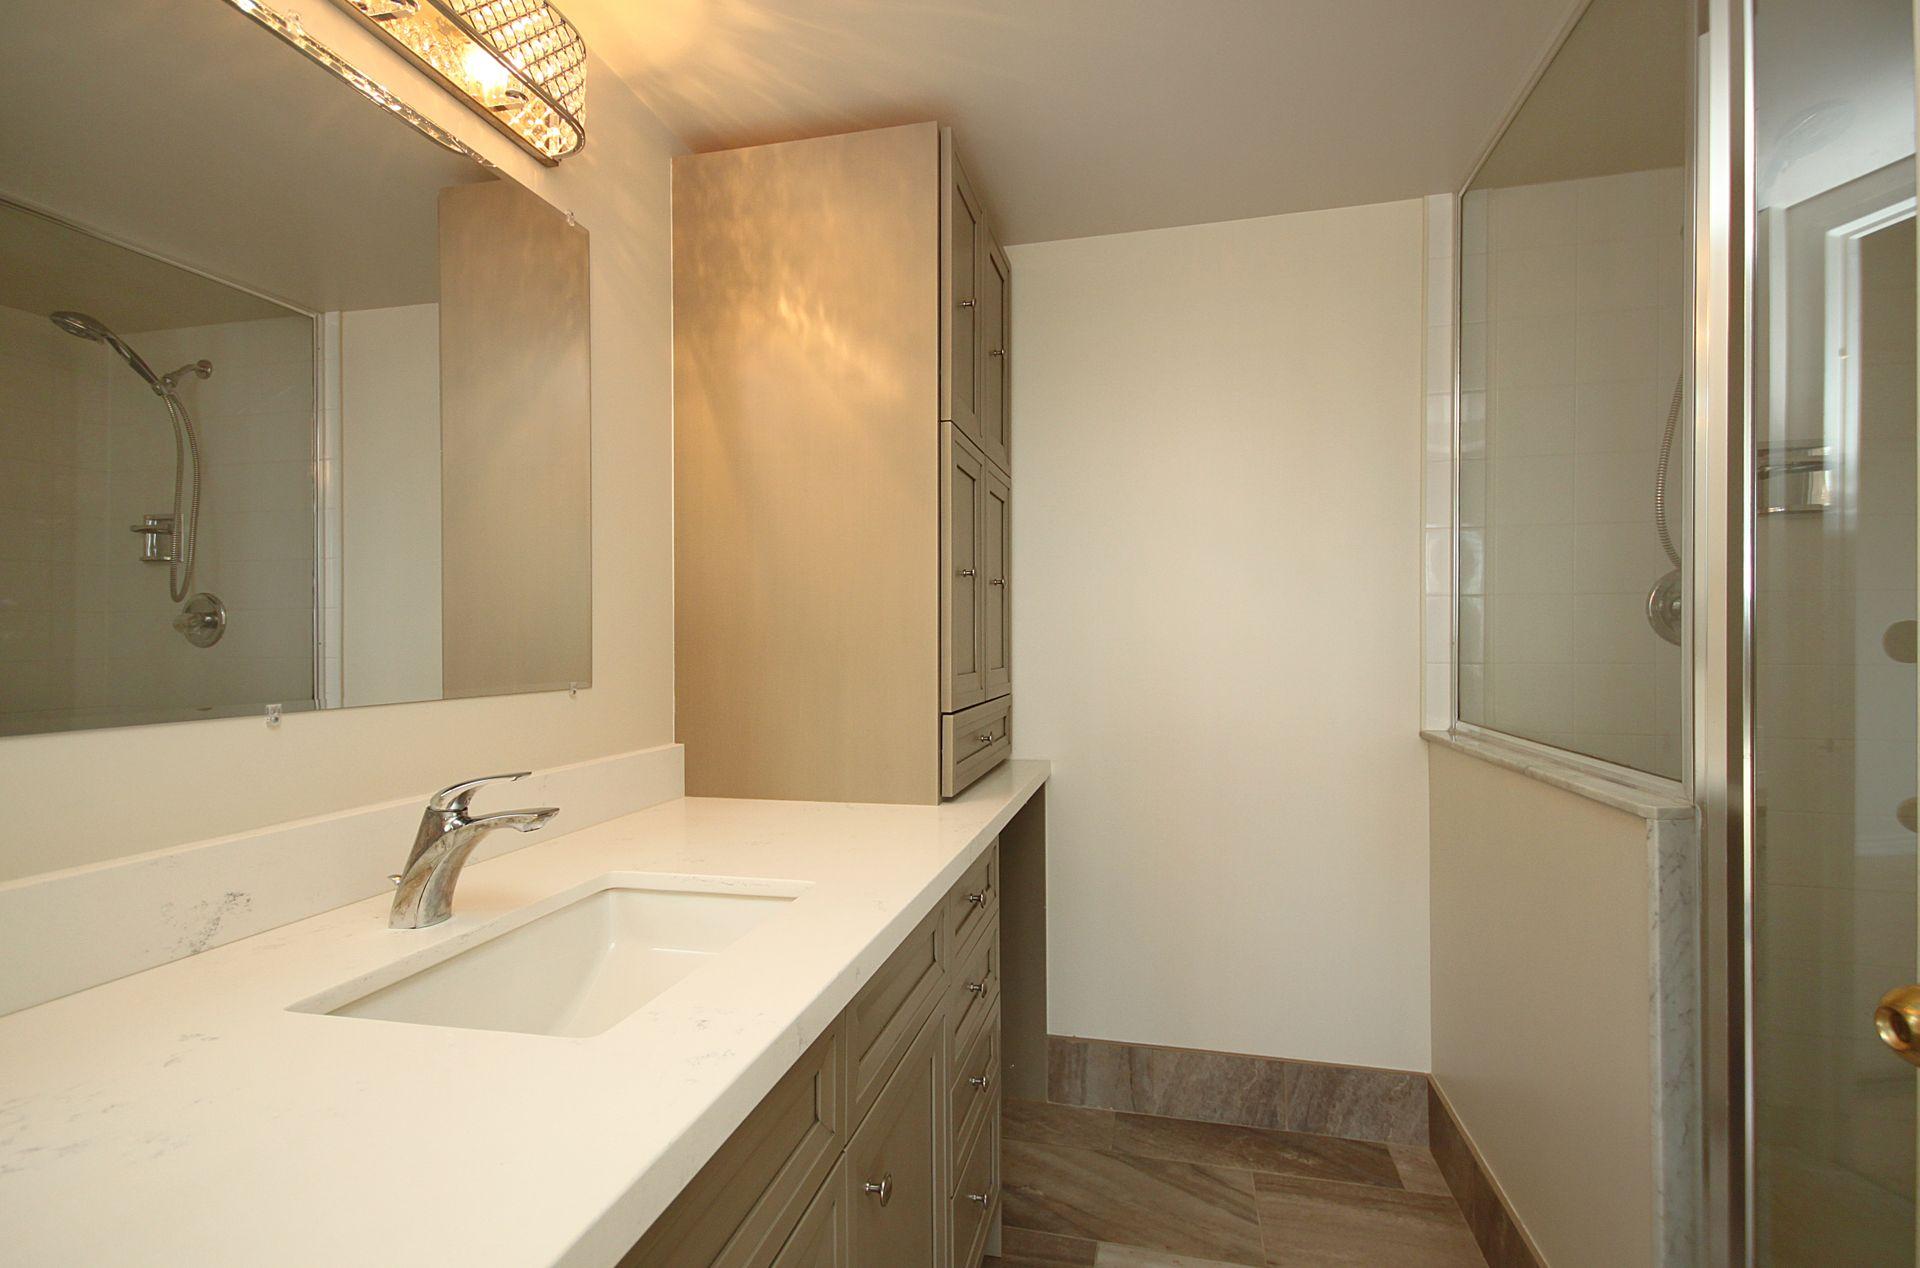 3 Piece Ensuite Bathroom at PH211 - 1121 Steeles Avenue W, Westminster-Branson, Toronto